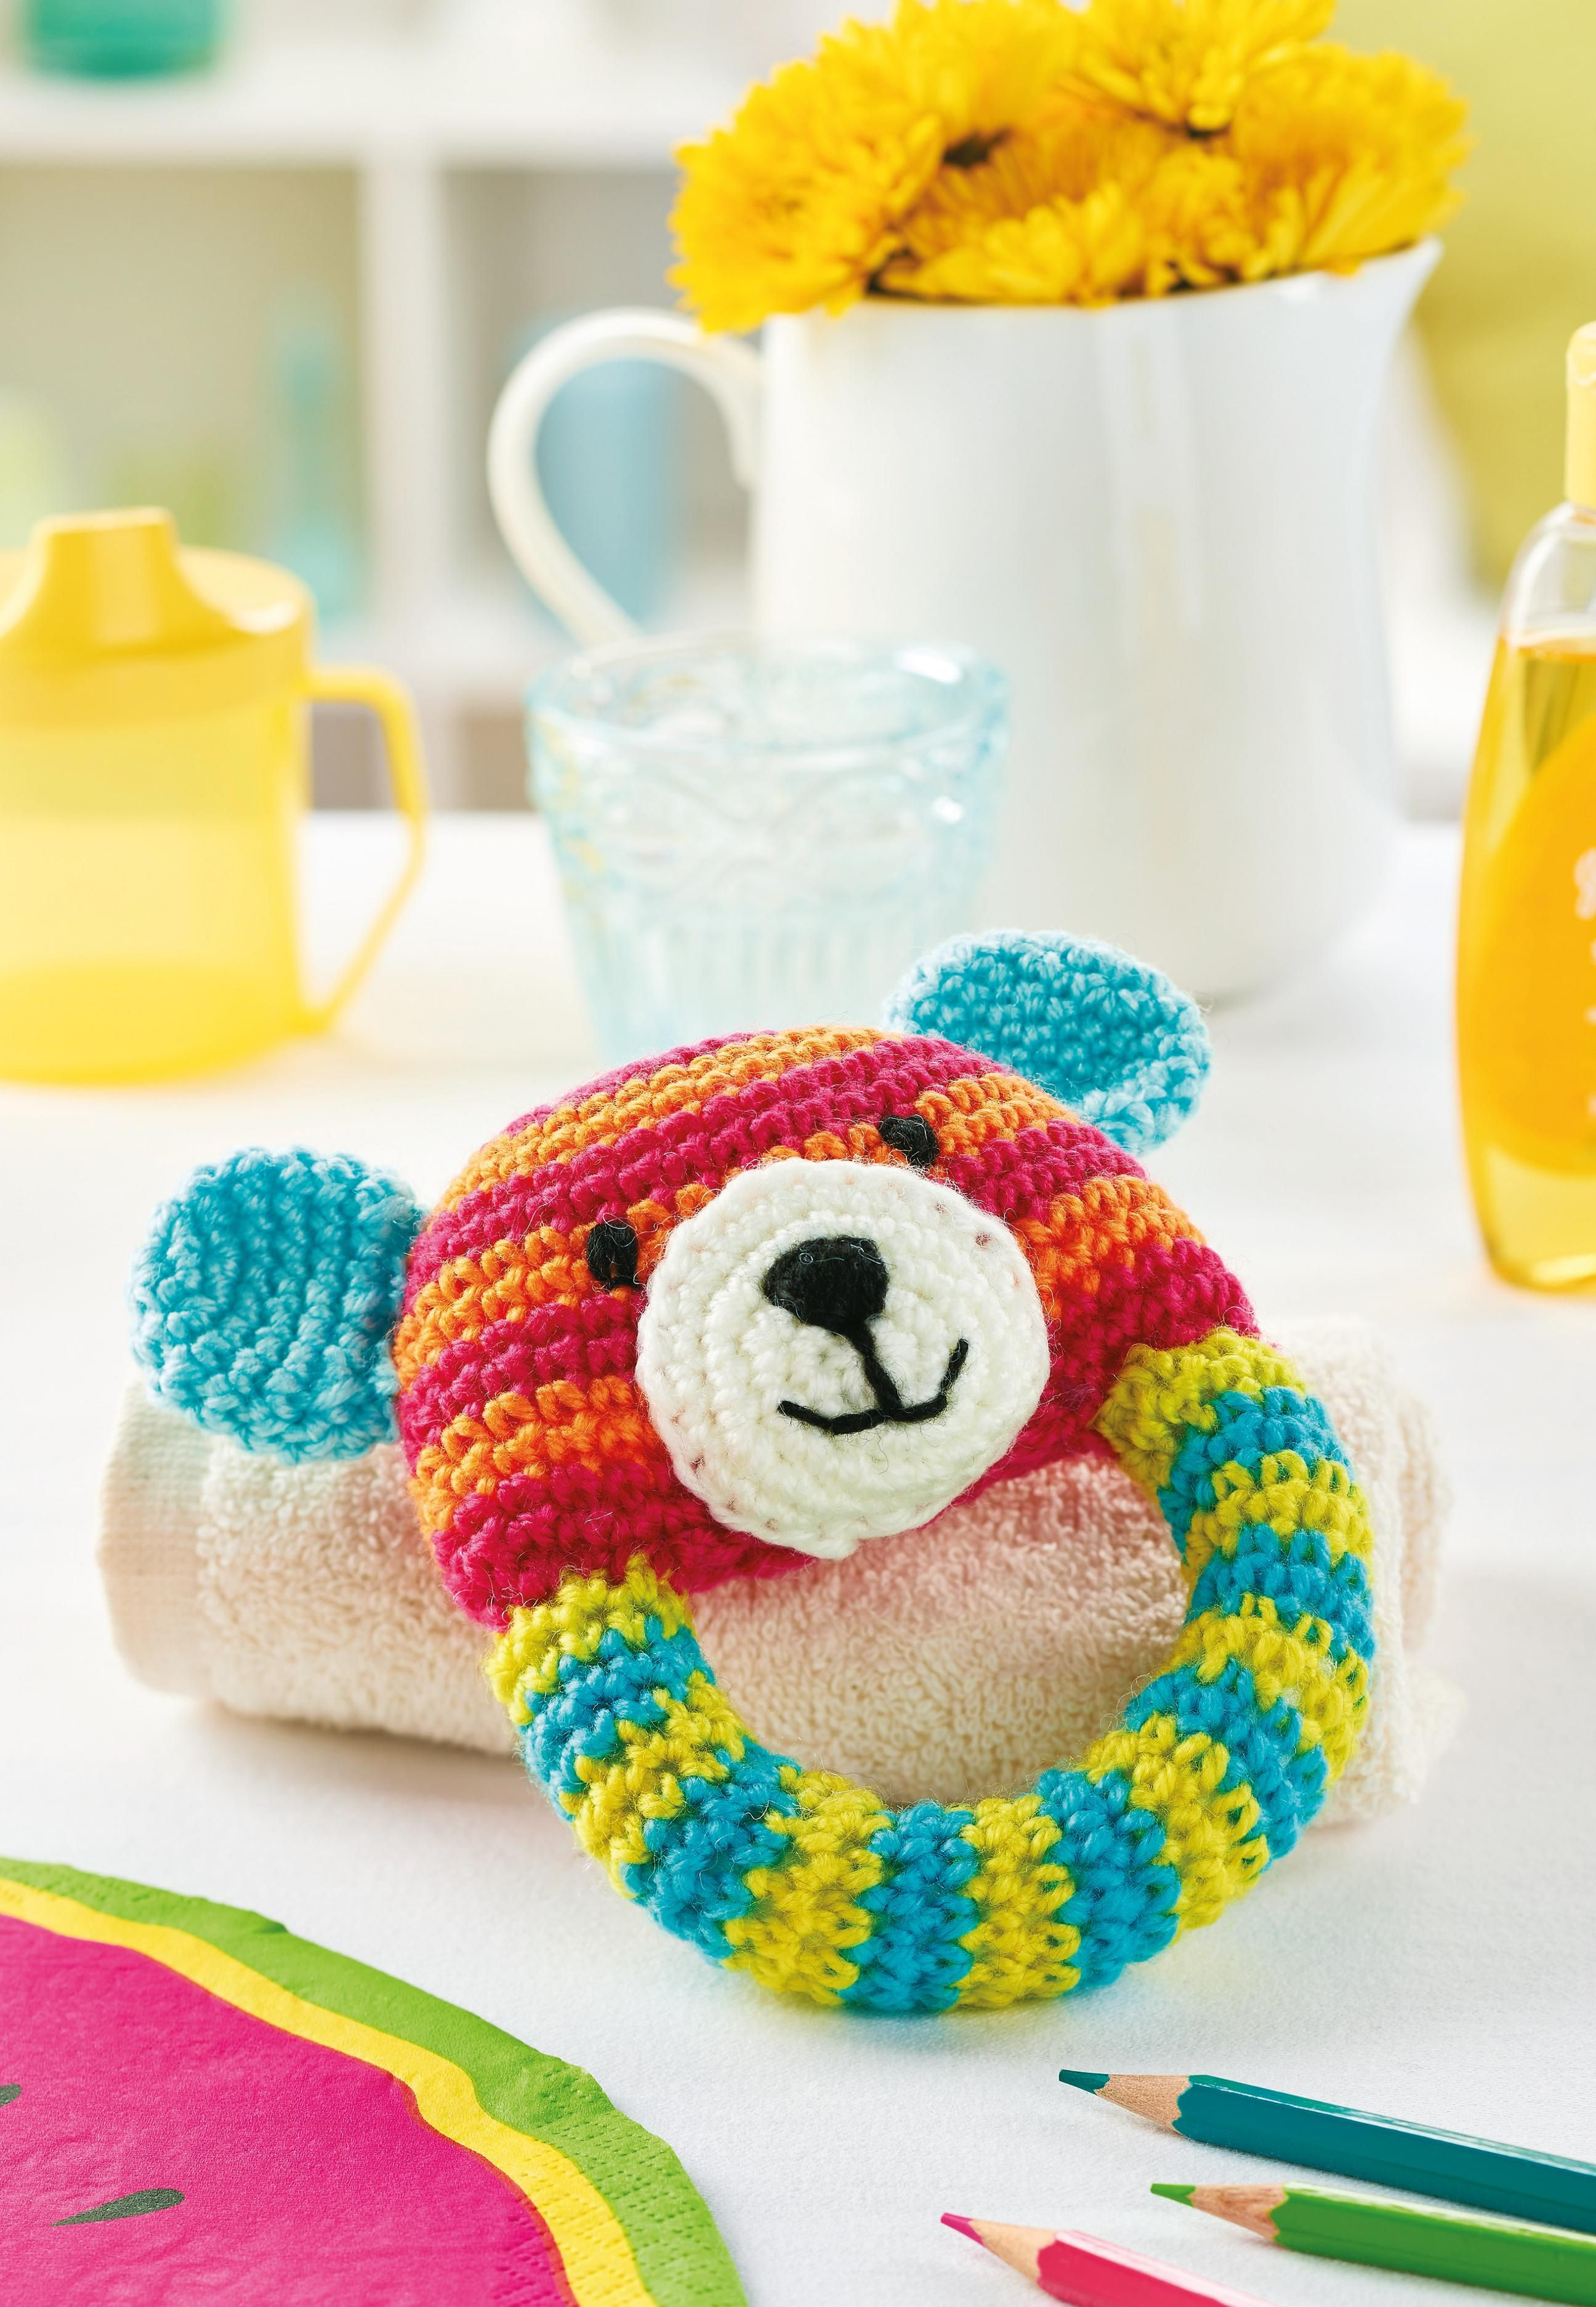 Teddy Bear Rattle Easy Grip Handle Free Downloadable